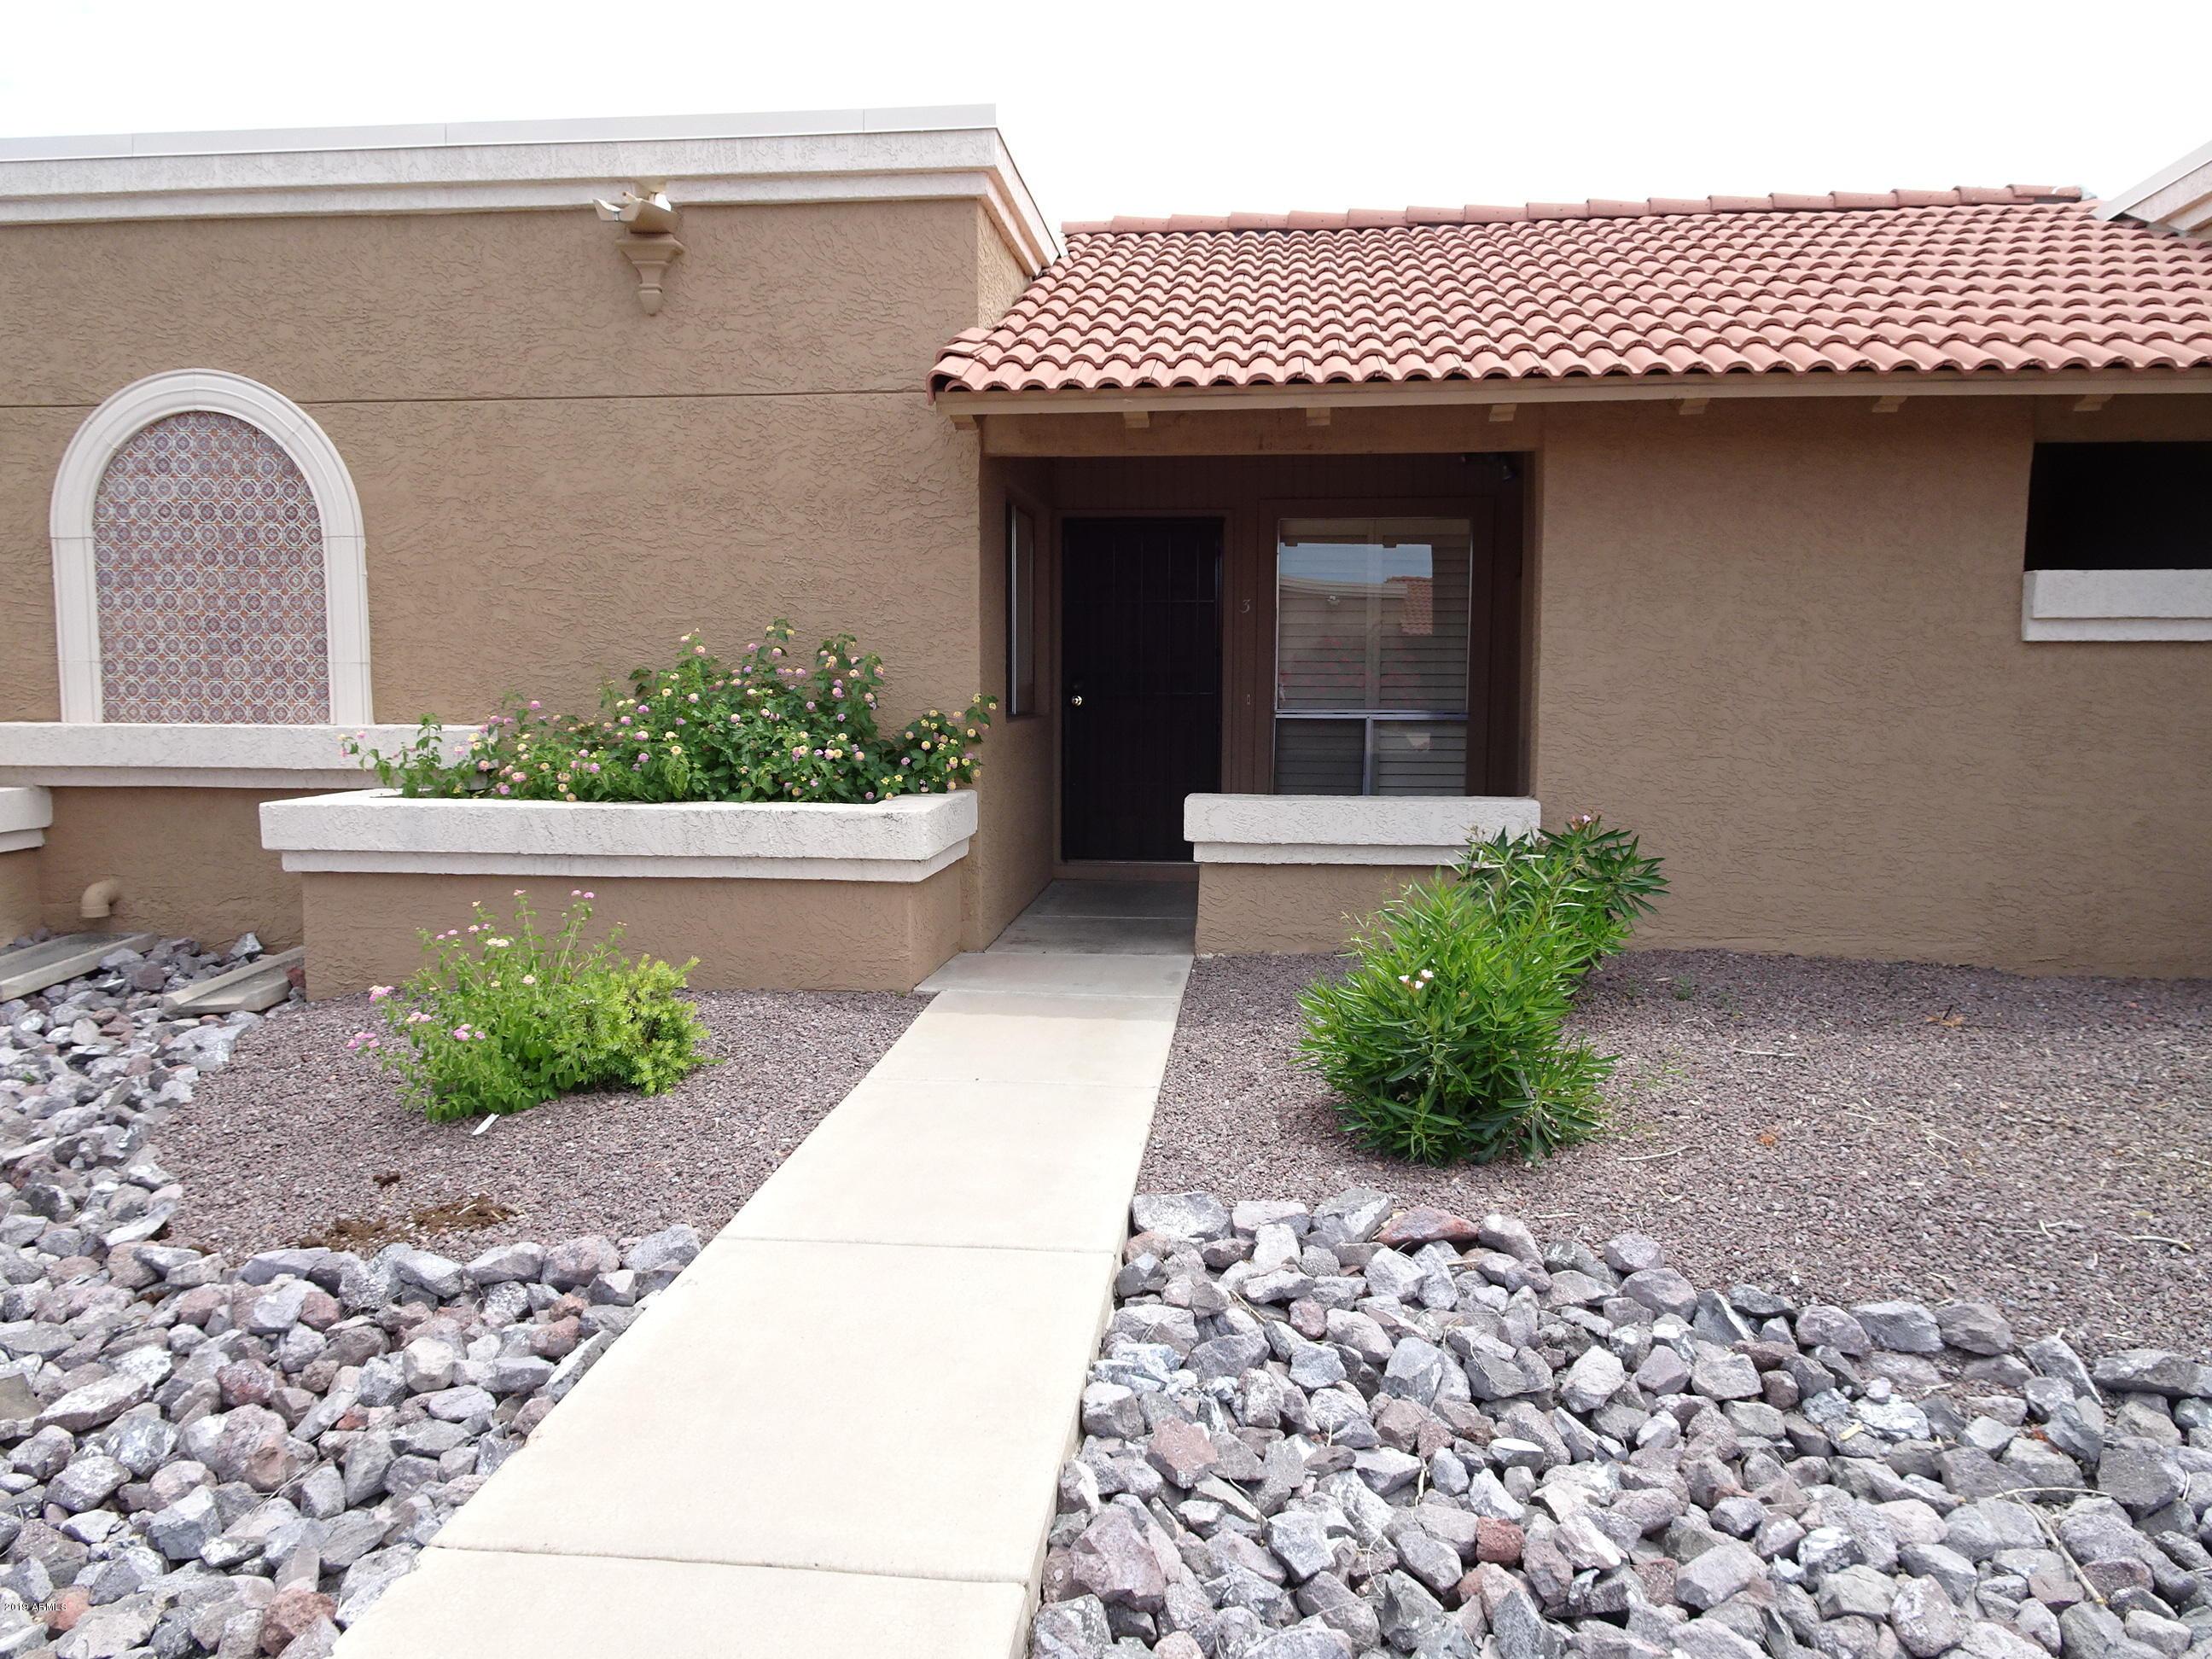 Photo for 501 W Hononegh Drive, Unit 3, Phoenix, AZ 85027 (MLS # 5933526)